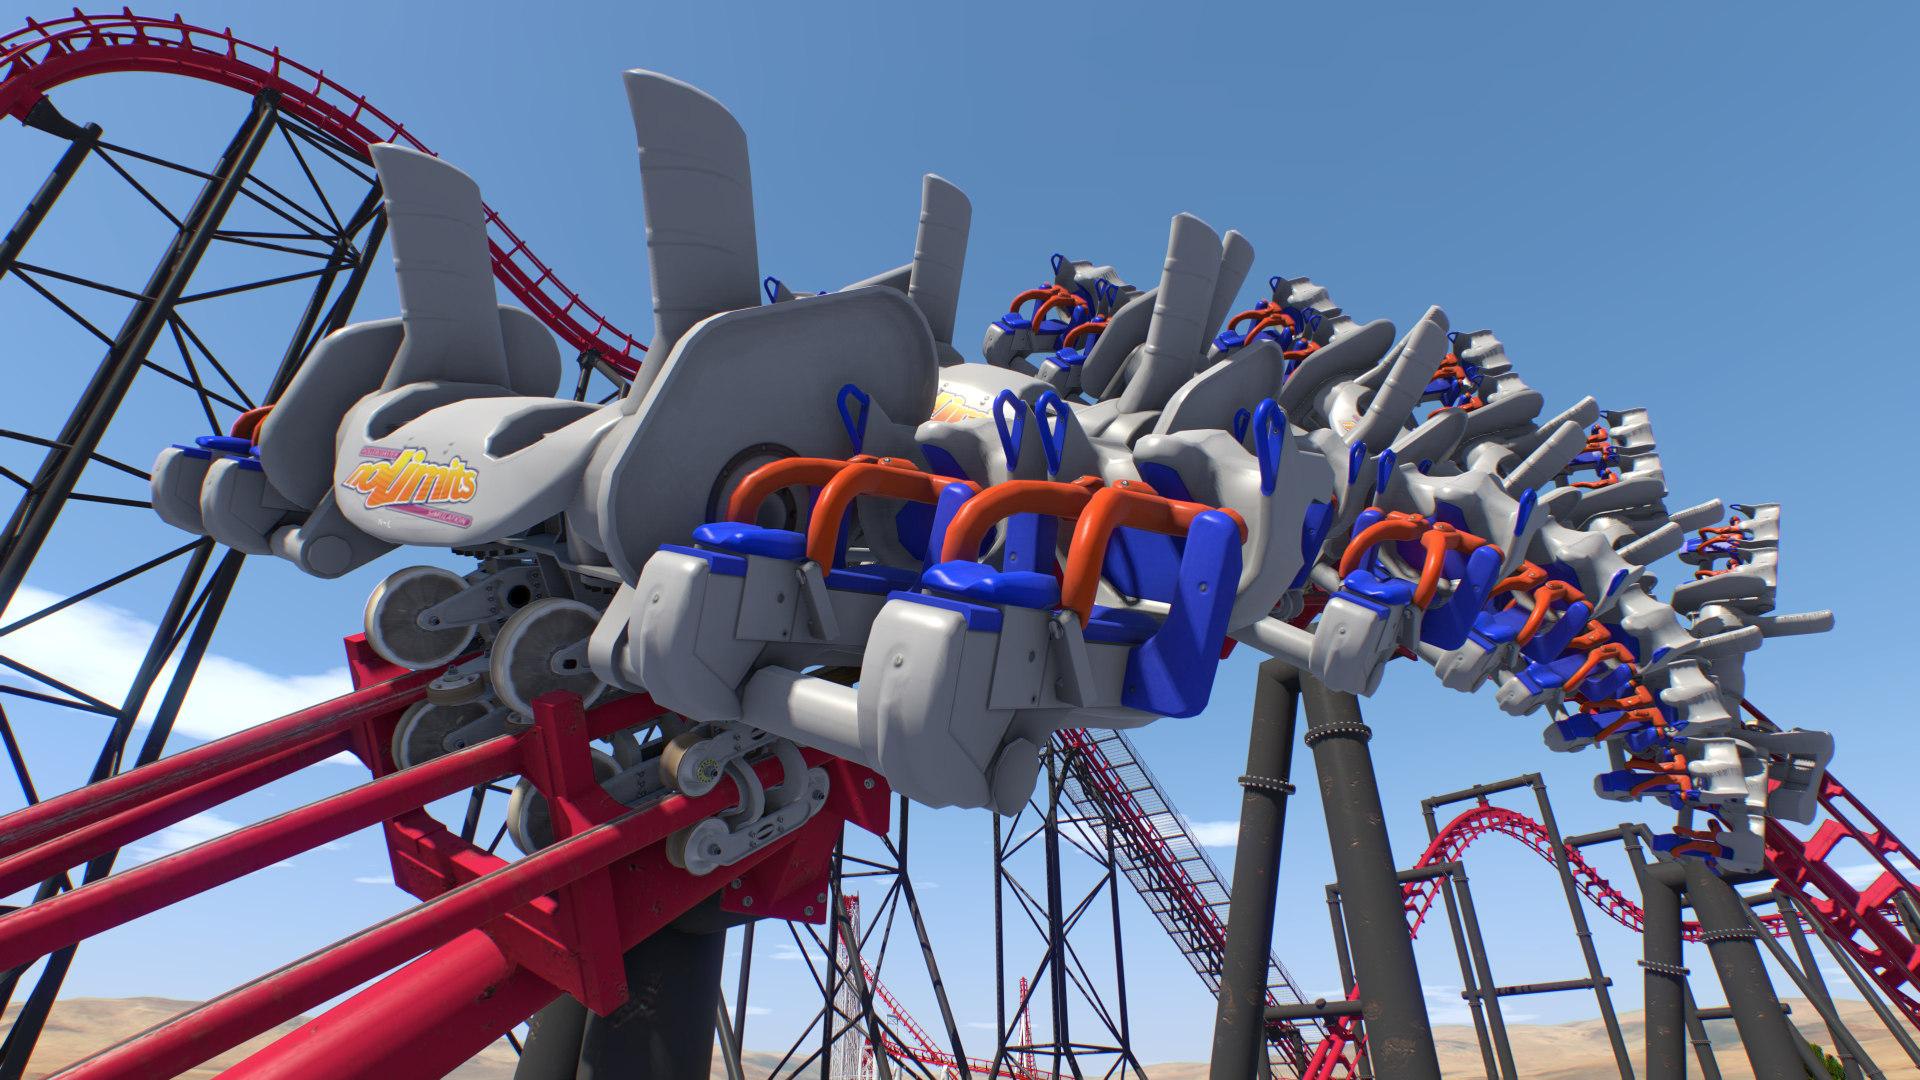 Nolimits 2 Roller Coaster Simulation On Steam Train Diagram